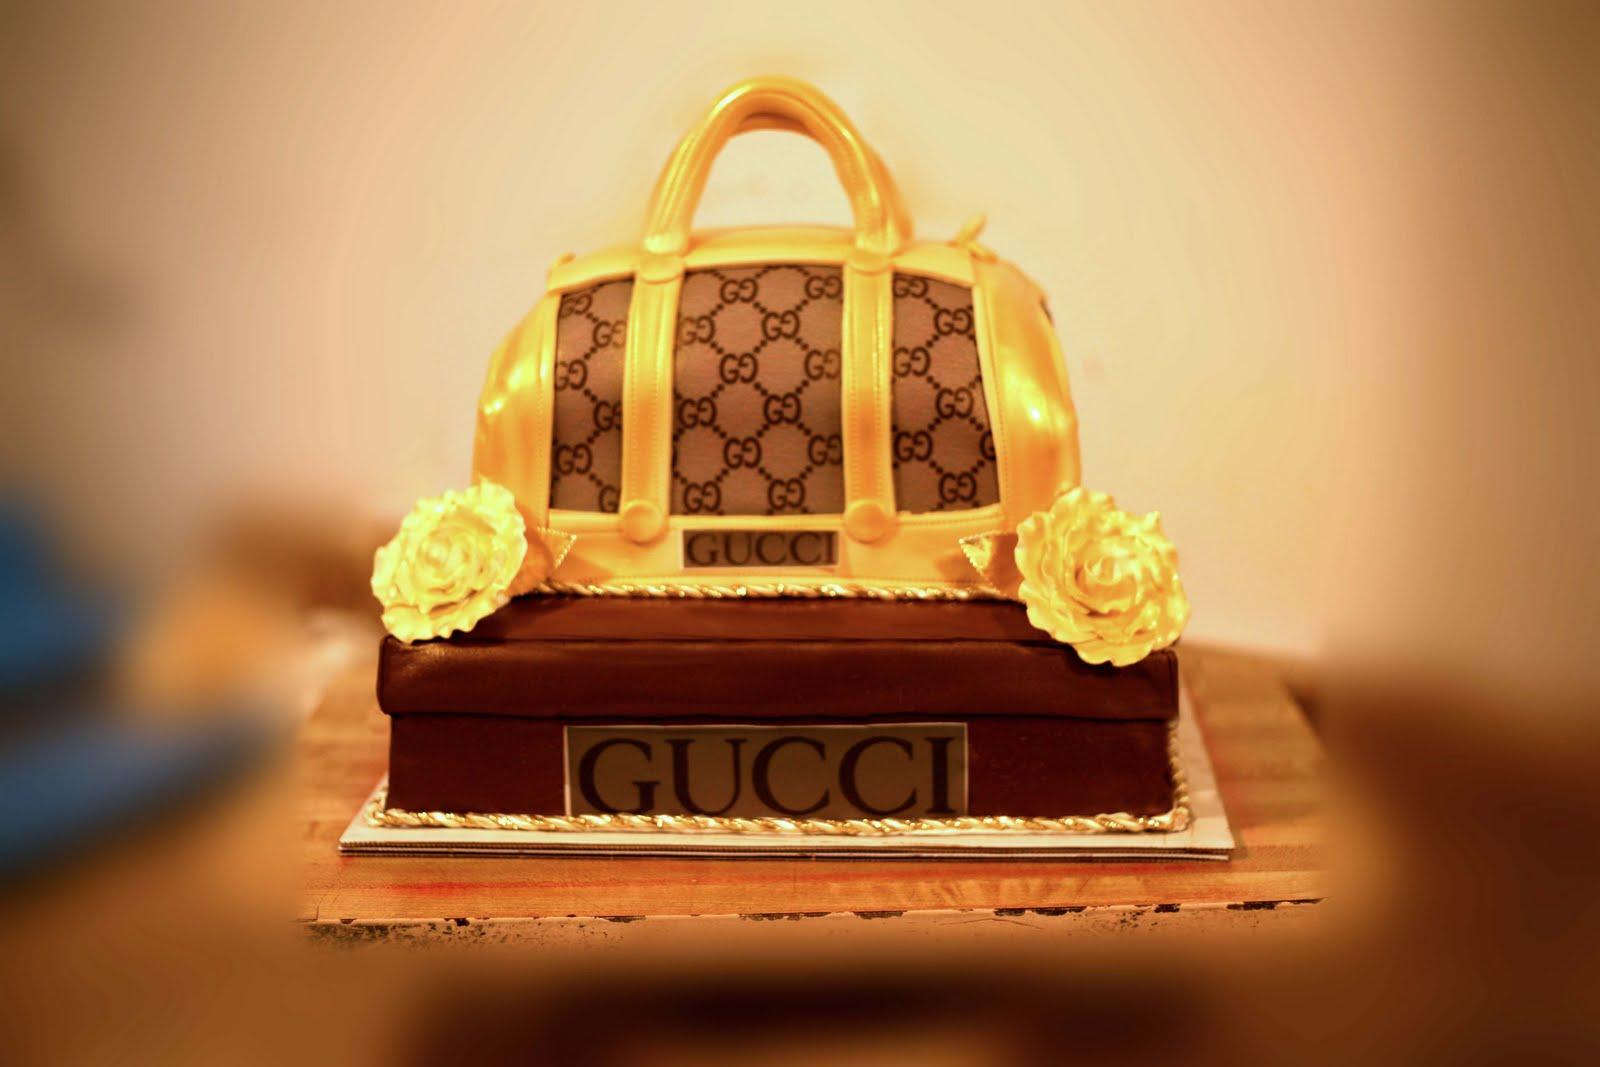 Hardy Cake Box